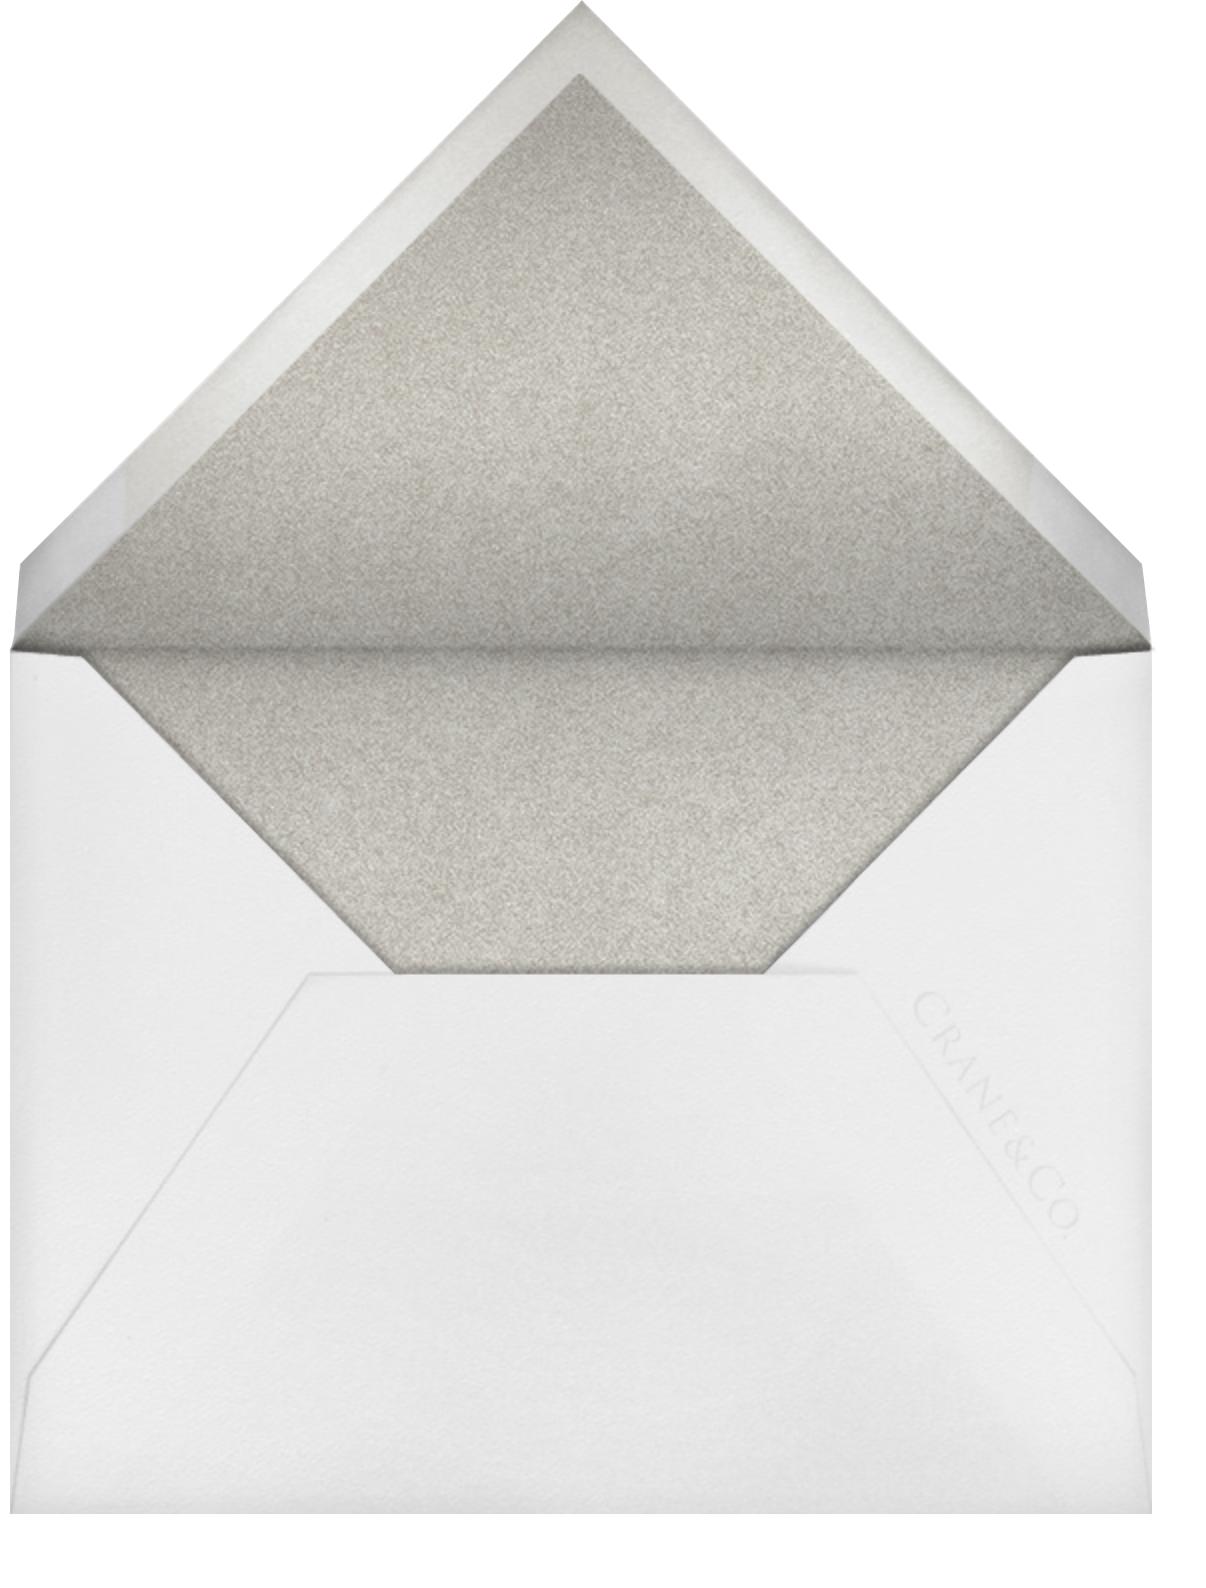 Monogram - Platinum - Vera Wang - All - envelope back